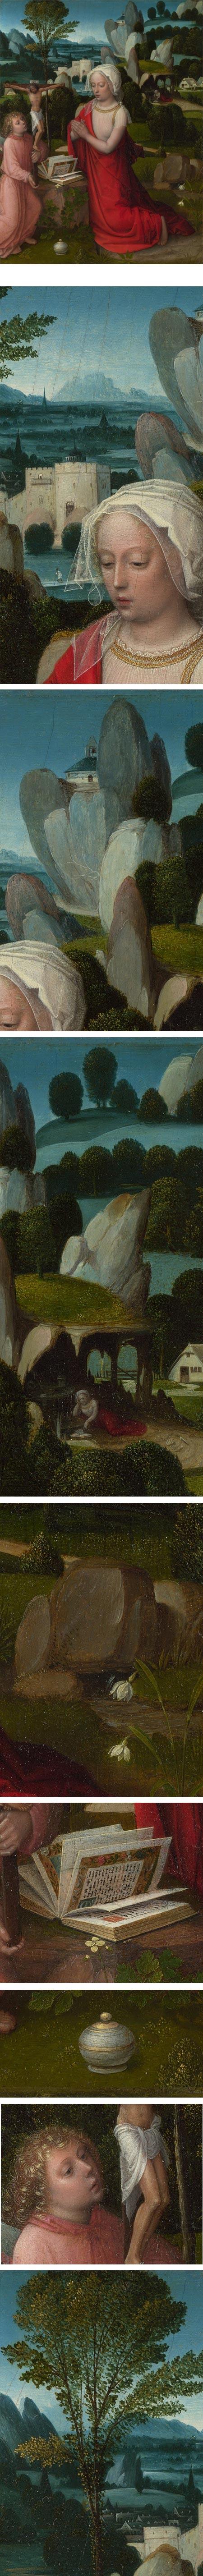 The Magdalen in a Landscape Adriaen Ysenbrandt